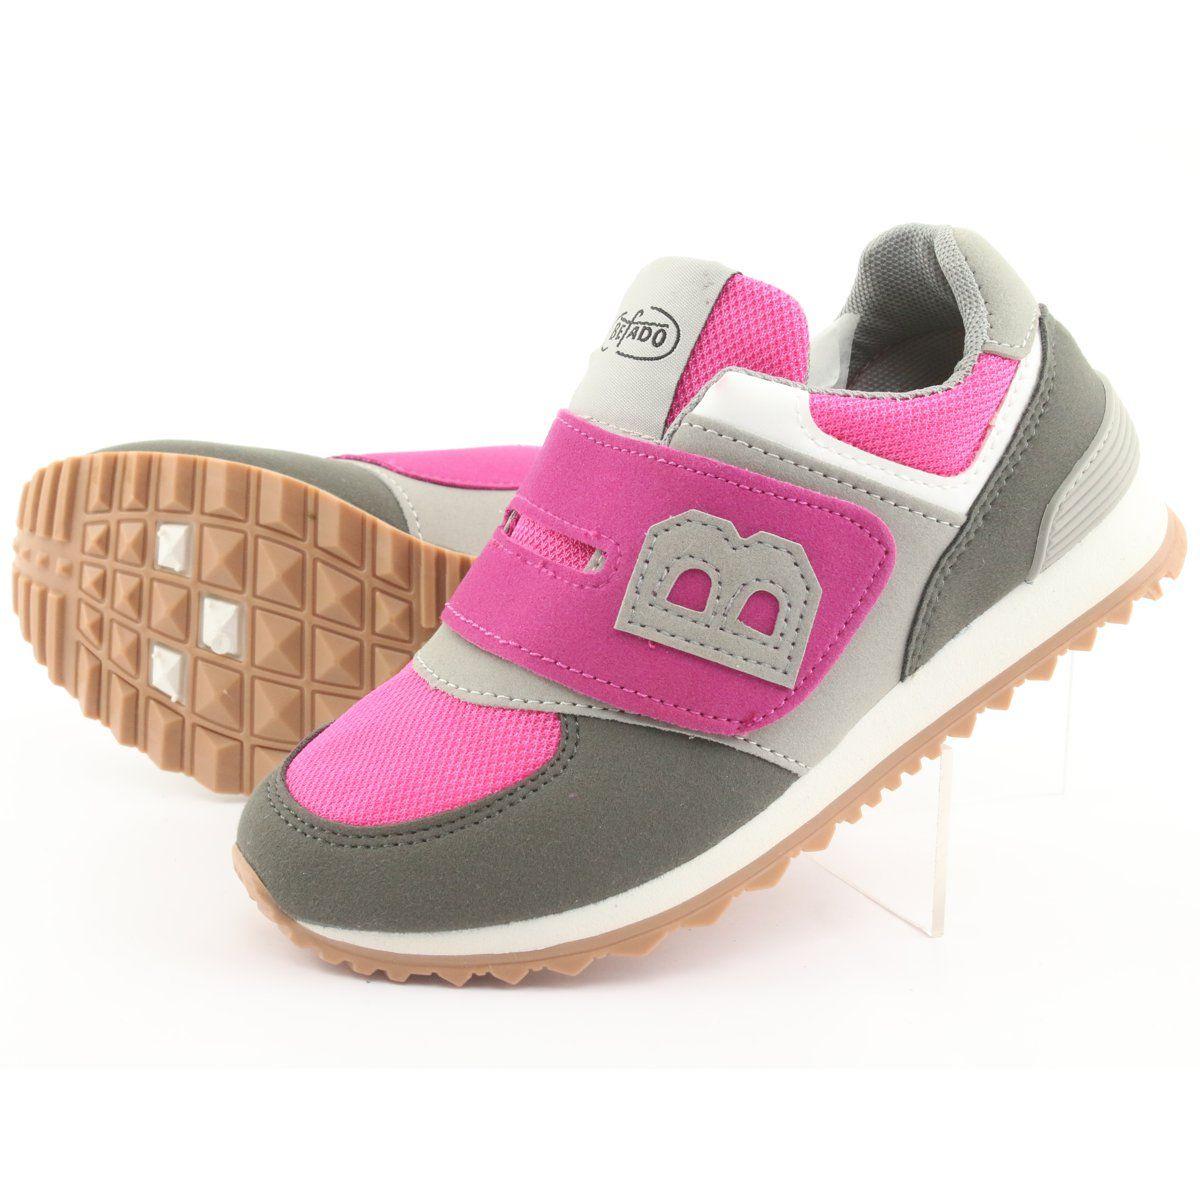 Befado Obuwie Dzieciece Do 23 Cm 516y039 Rozowe Szare Childrens Shoes Kid Shoes Shoes